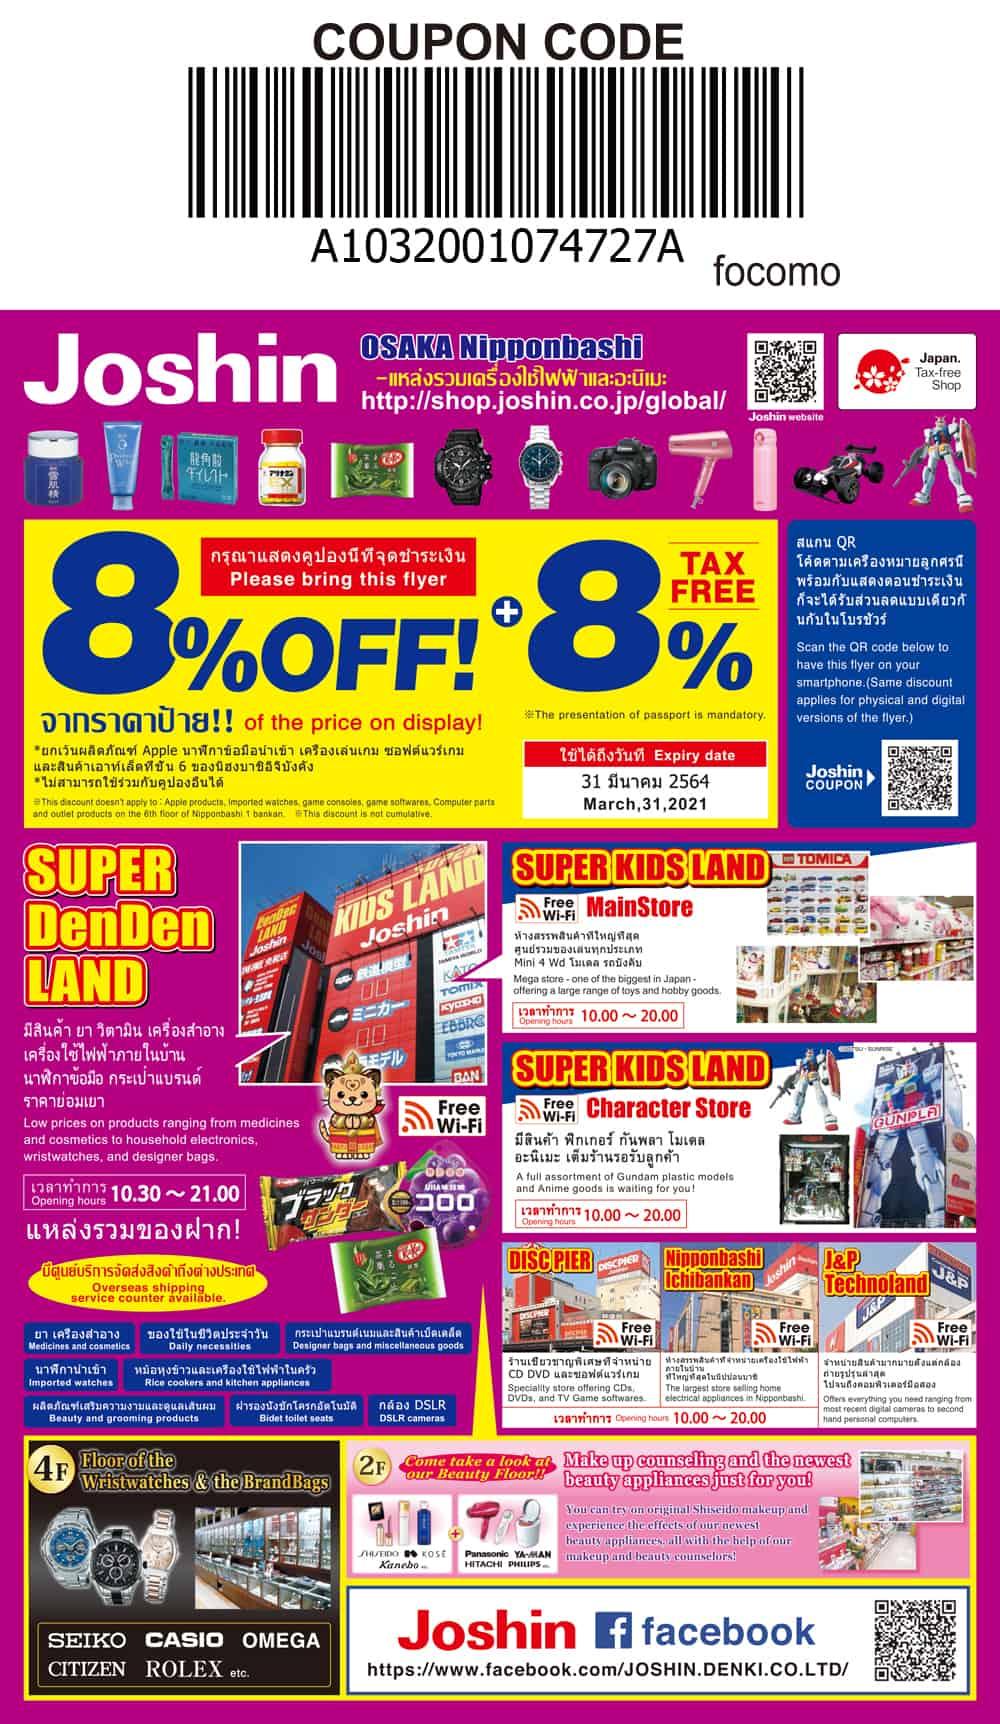 Joshin coupon code x KIJI